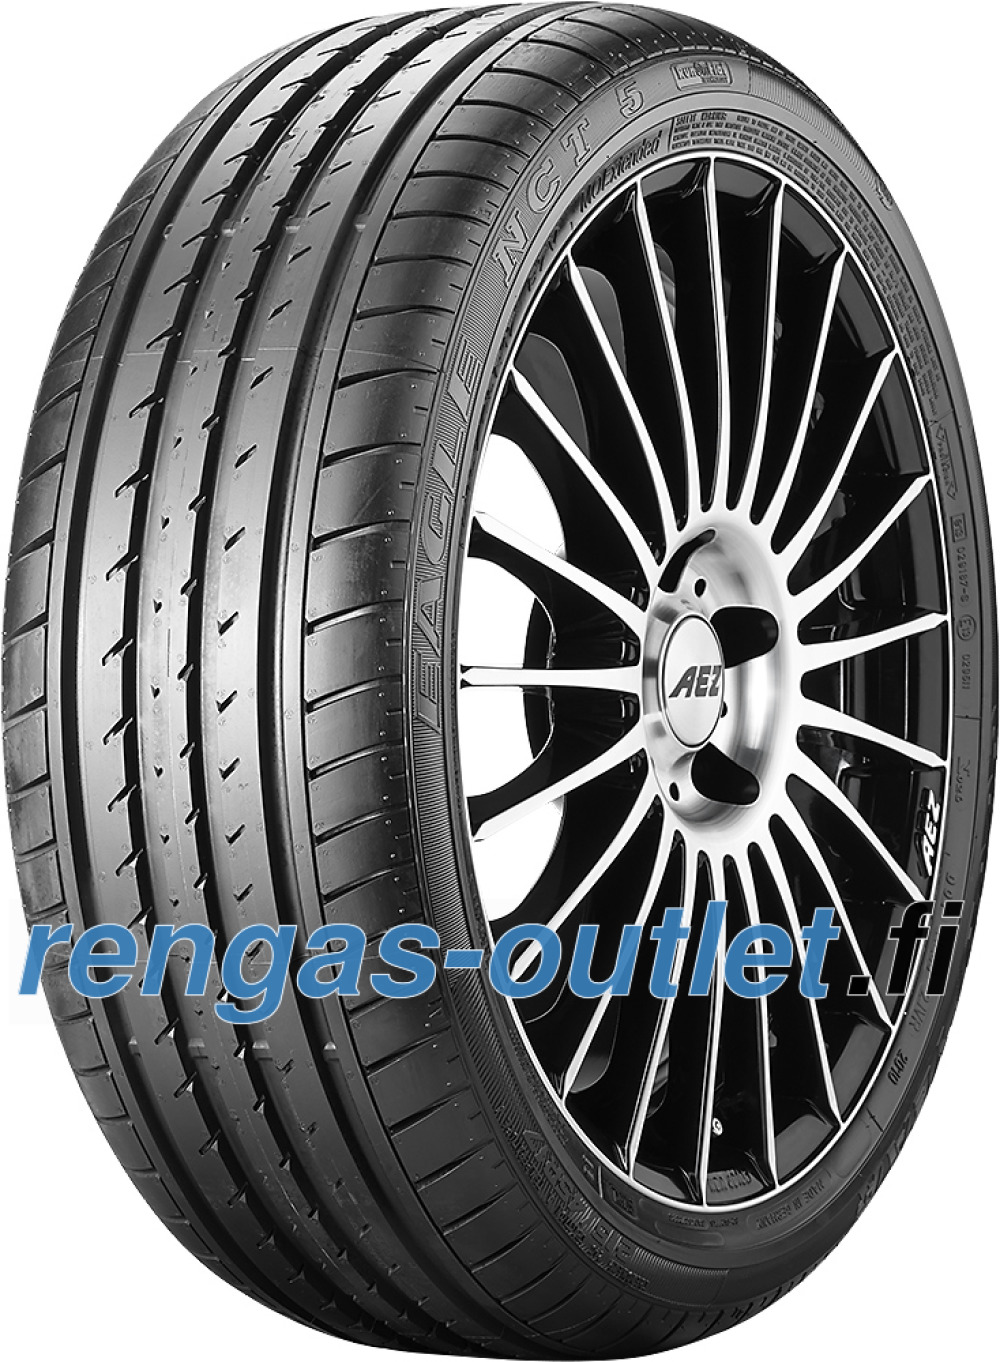 Goodyear Eagle NCT 5 ROF ( 285/45 R21 109W *, vannesuojalla (MFS), runflat WSW )